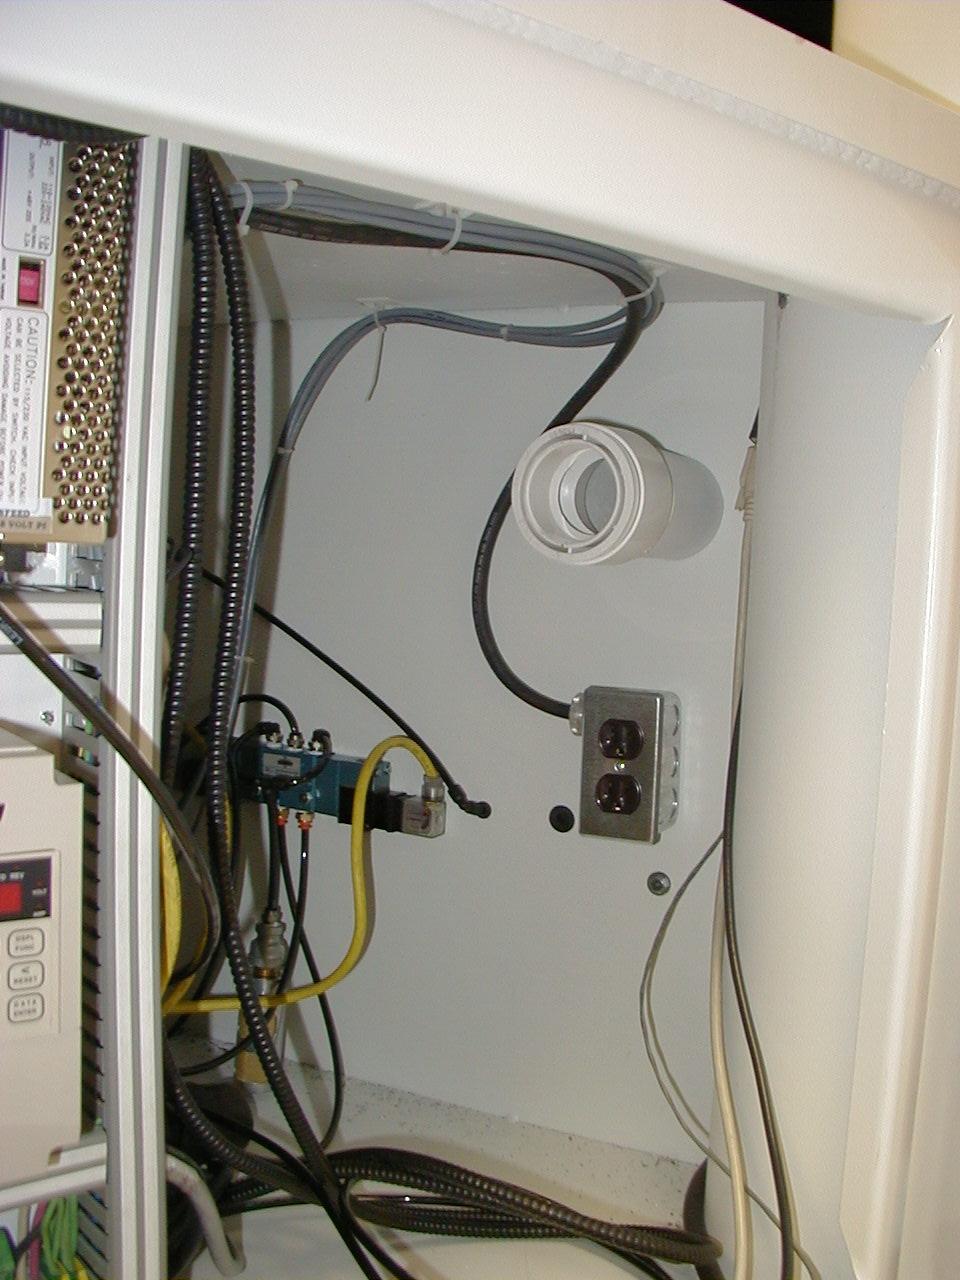 endicott machine and tool